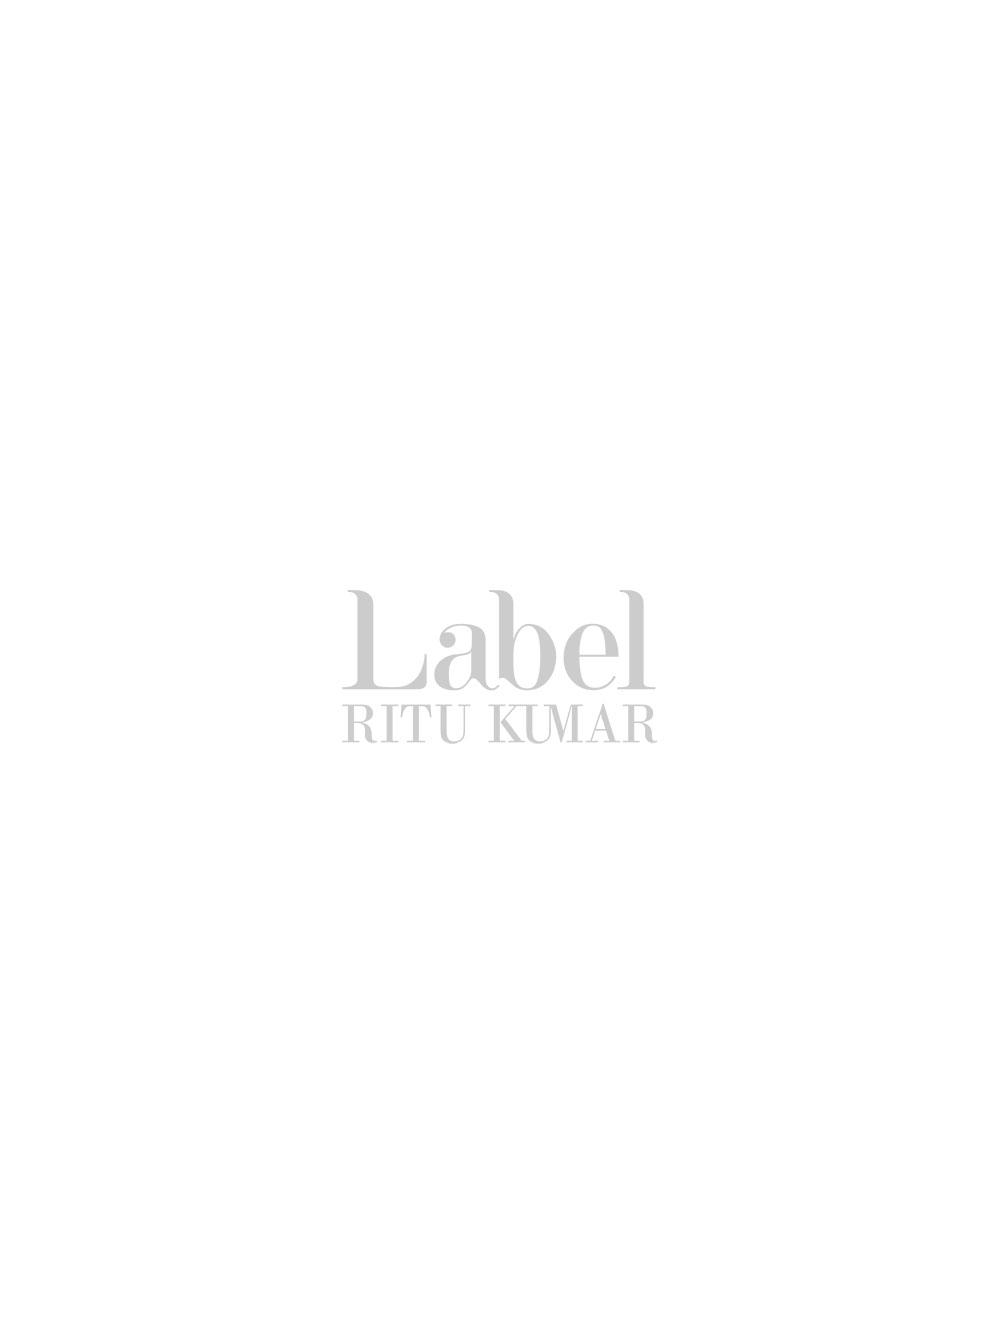 Blue Floral Long Dress By label Ritu Kumar